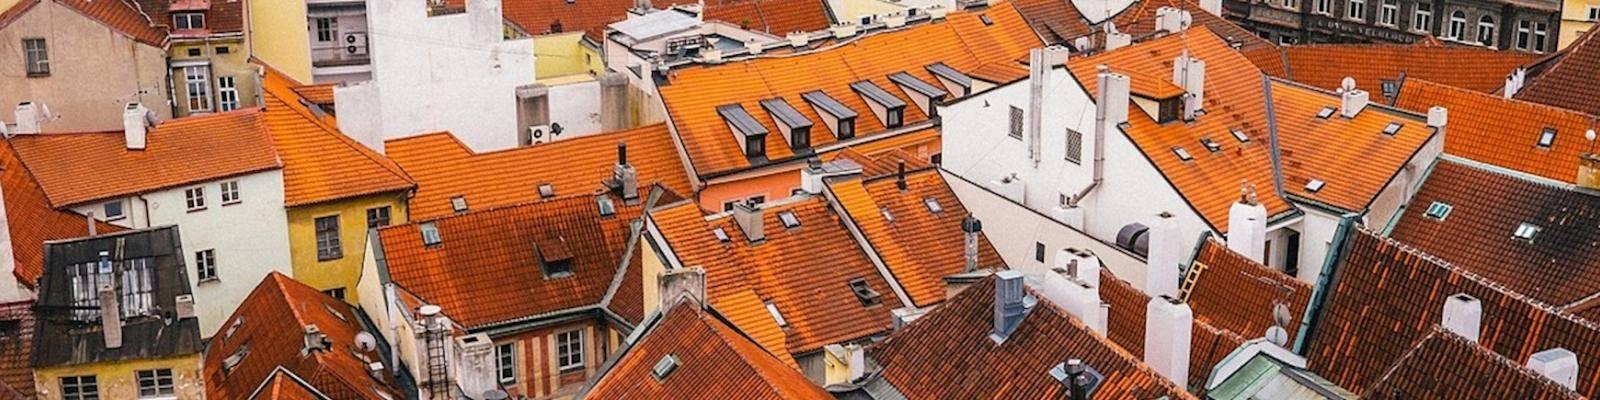 luchtfoto daken huizen